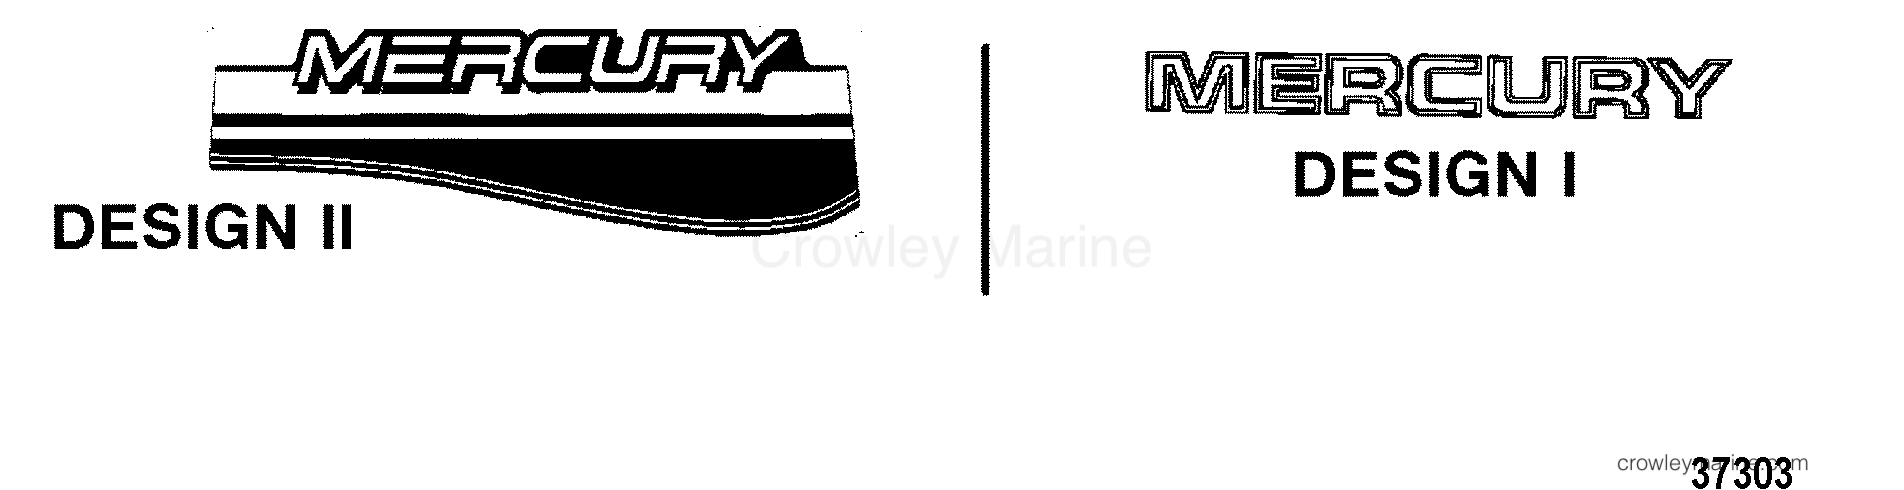 1996 Mercury Outboard 30 [ELHO] - 1031311SE MISCELLANEOUS INFORMATION section